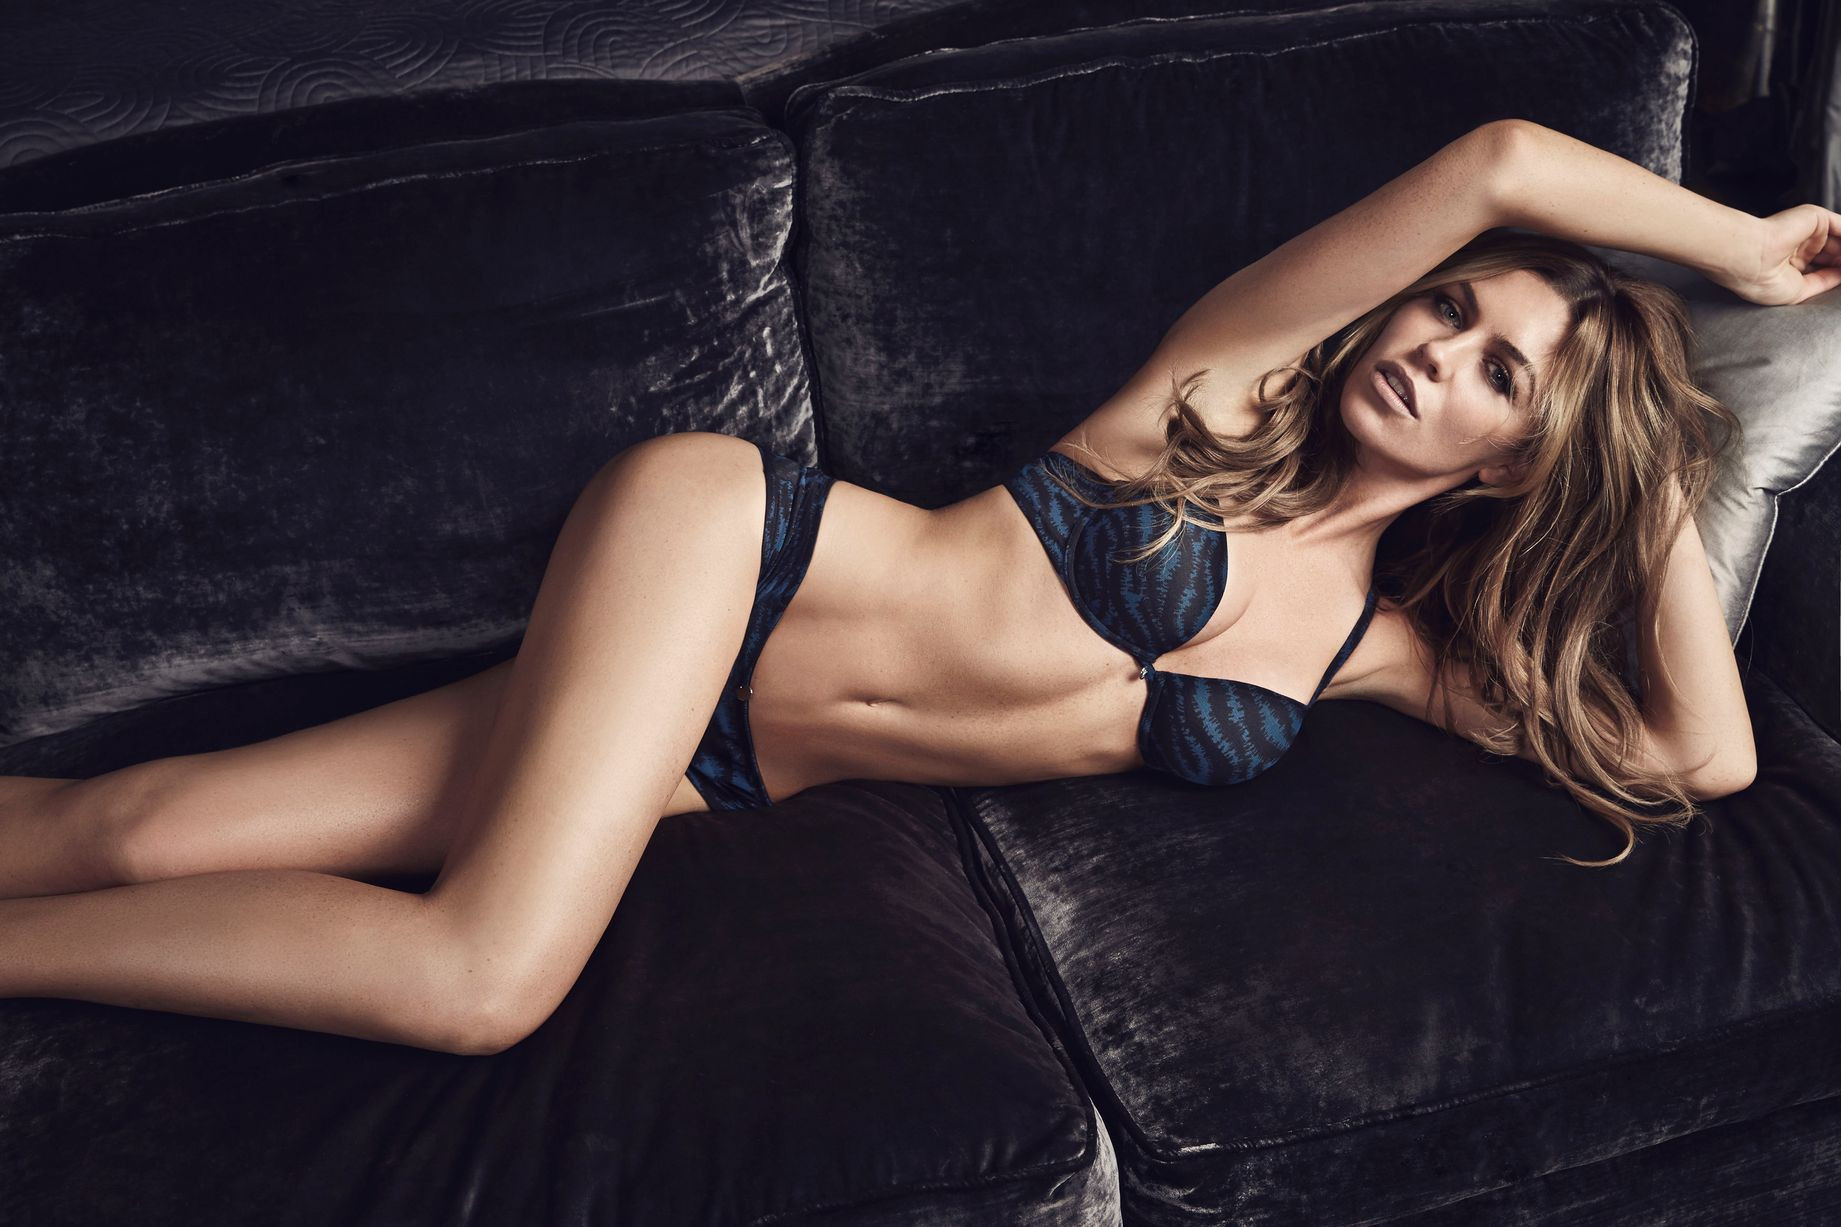 Ana Delia De Iturrondo Nude sexy celebrities   girls definitely in control